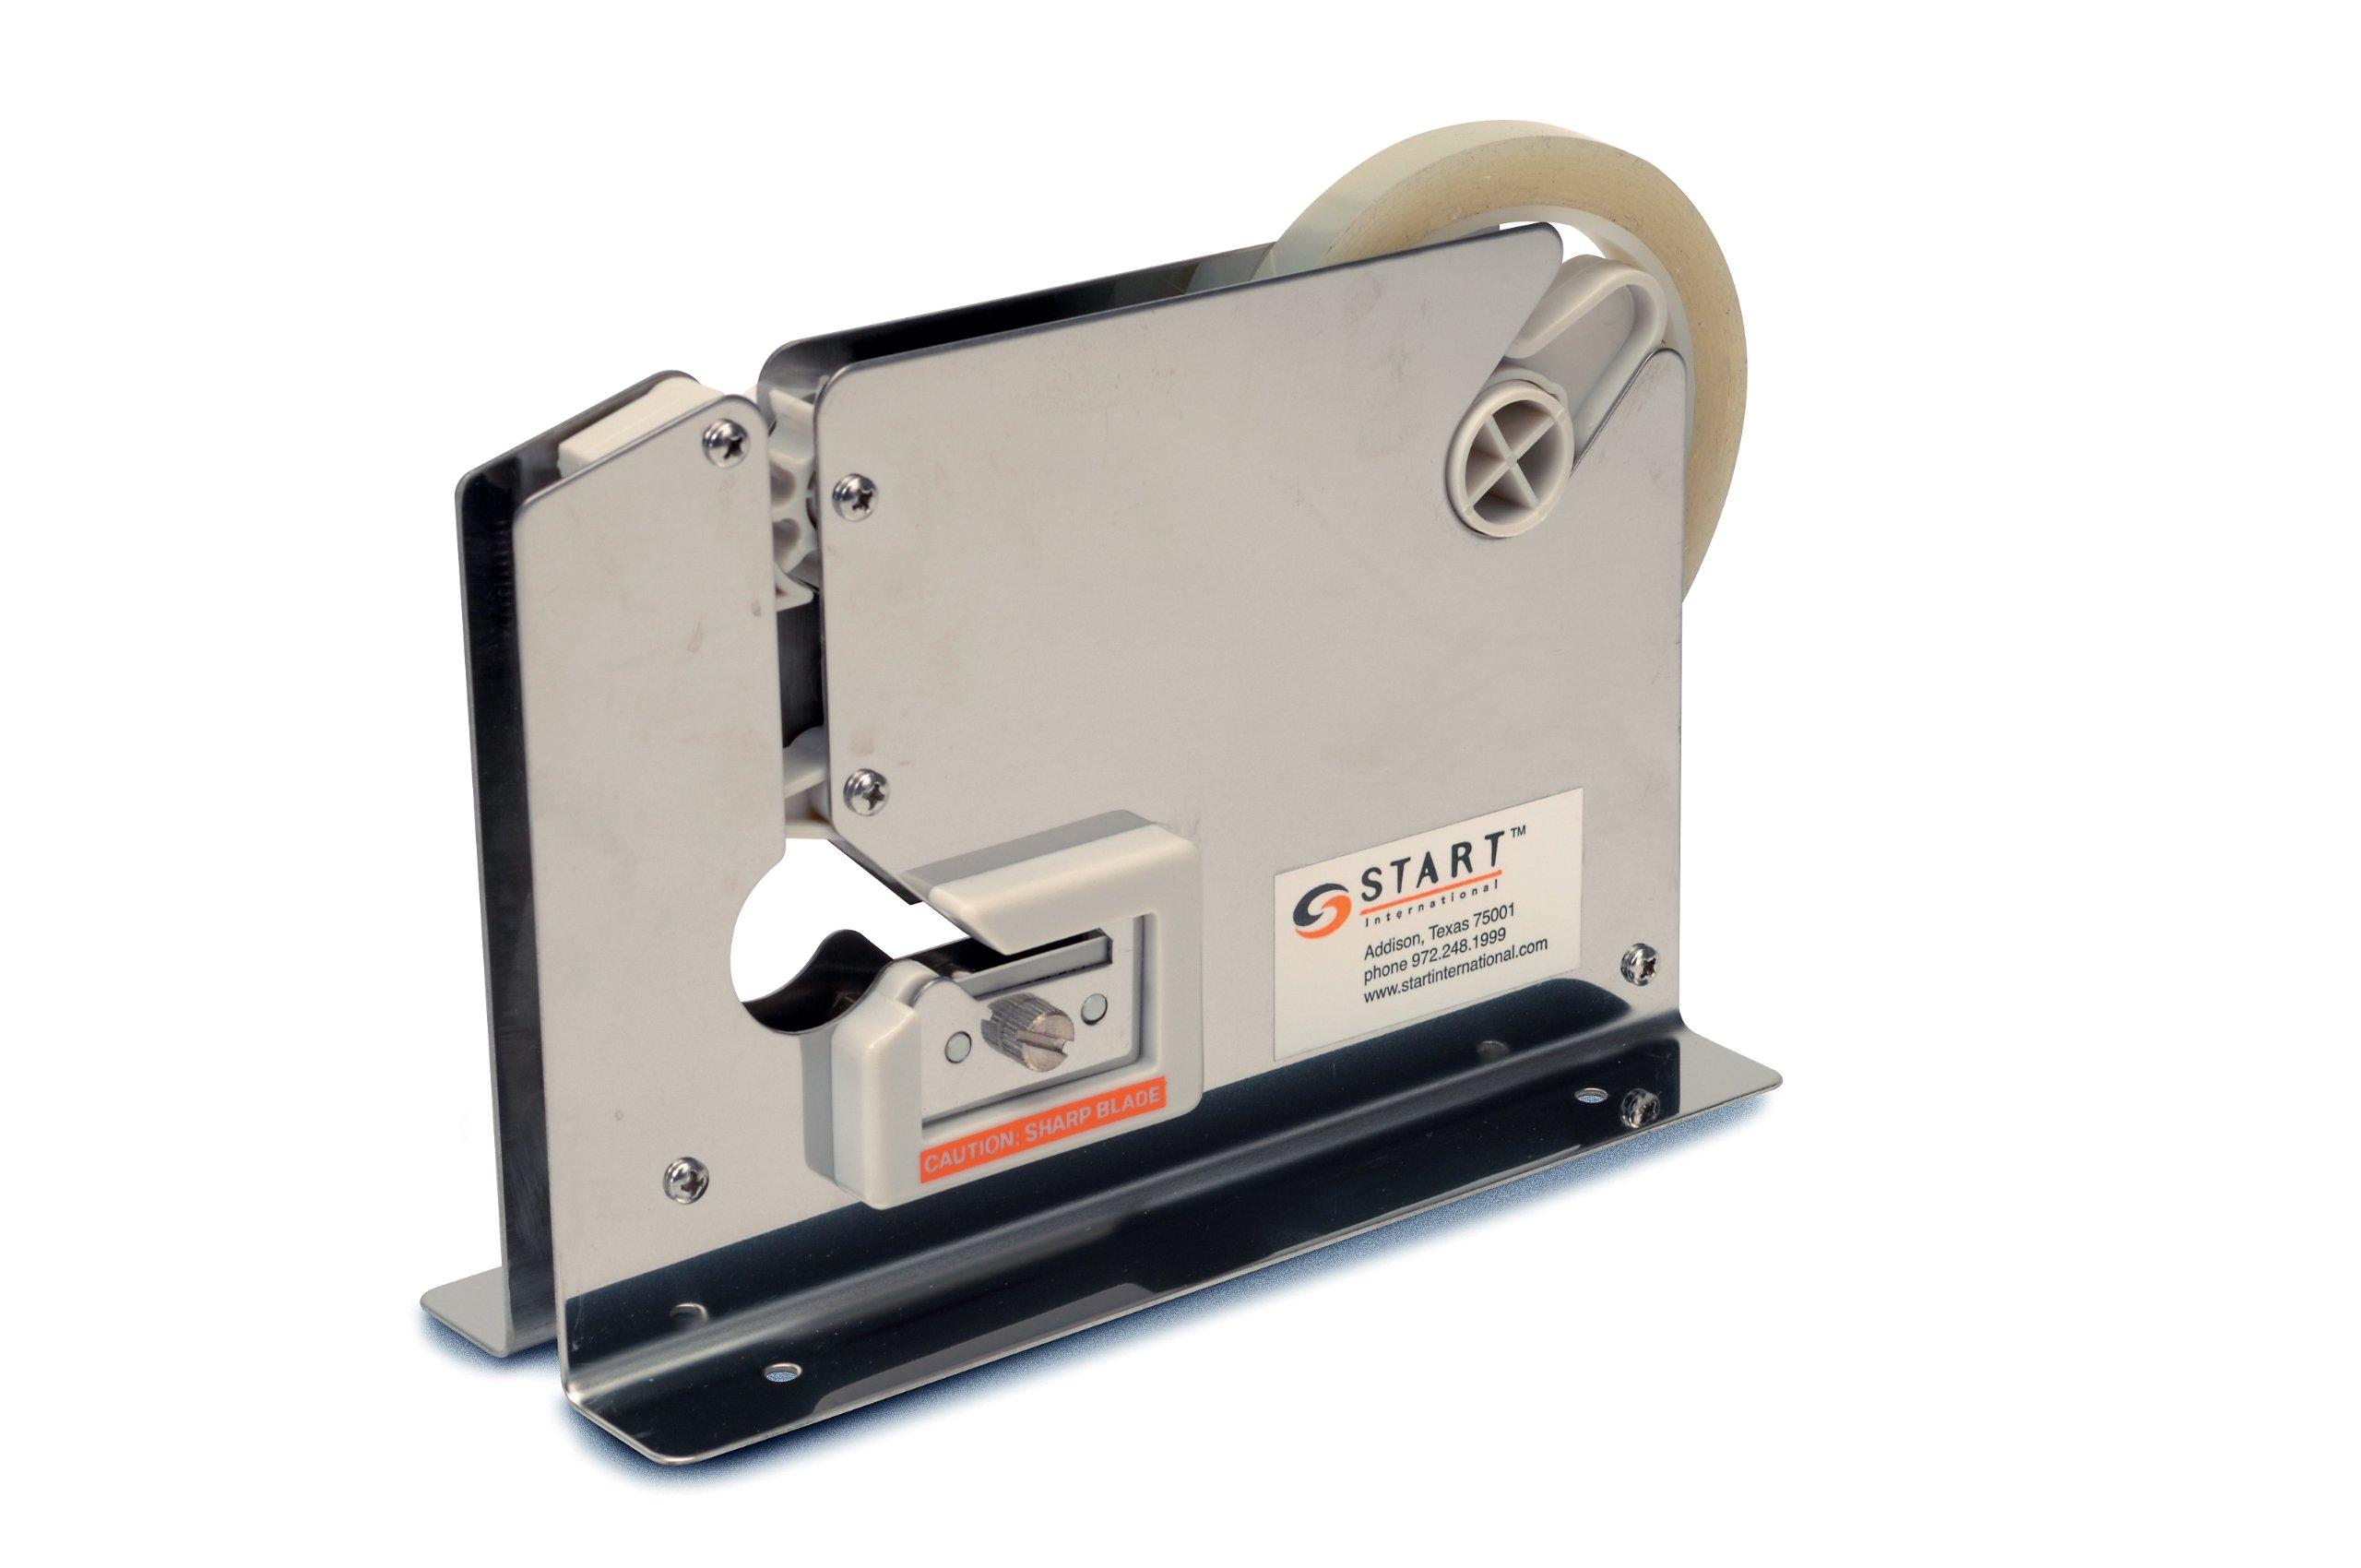 START International SL7606 Stainless Steel Manual Bag Sealer with Cutter, Case of 10